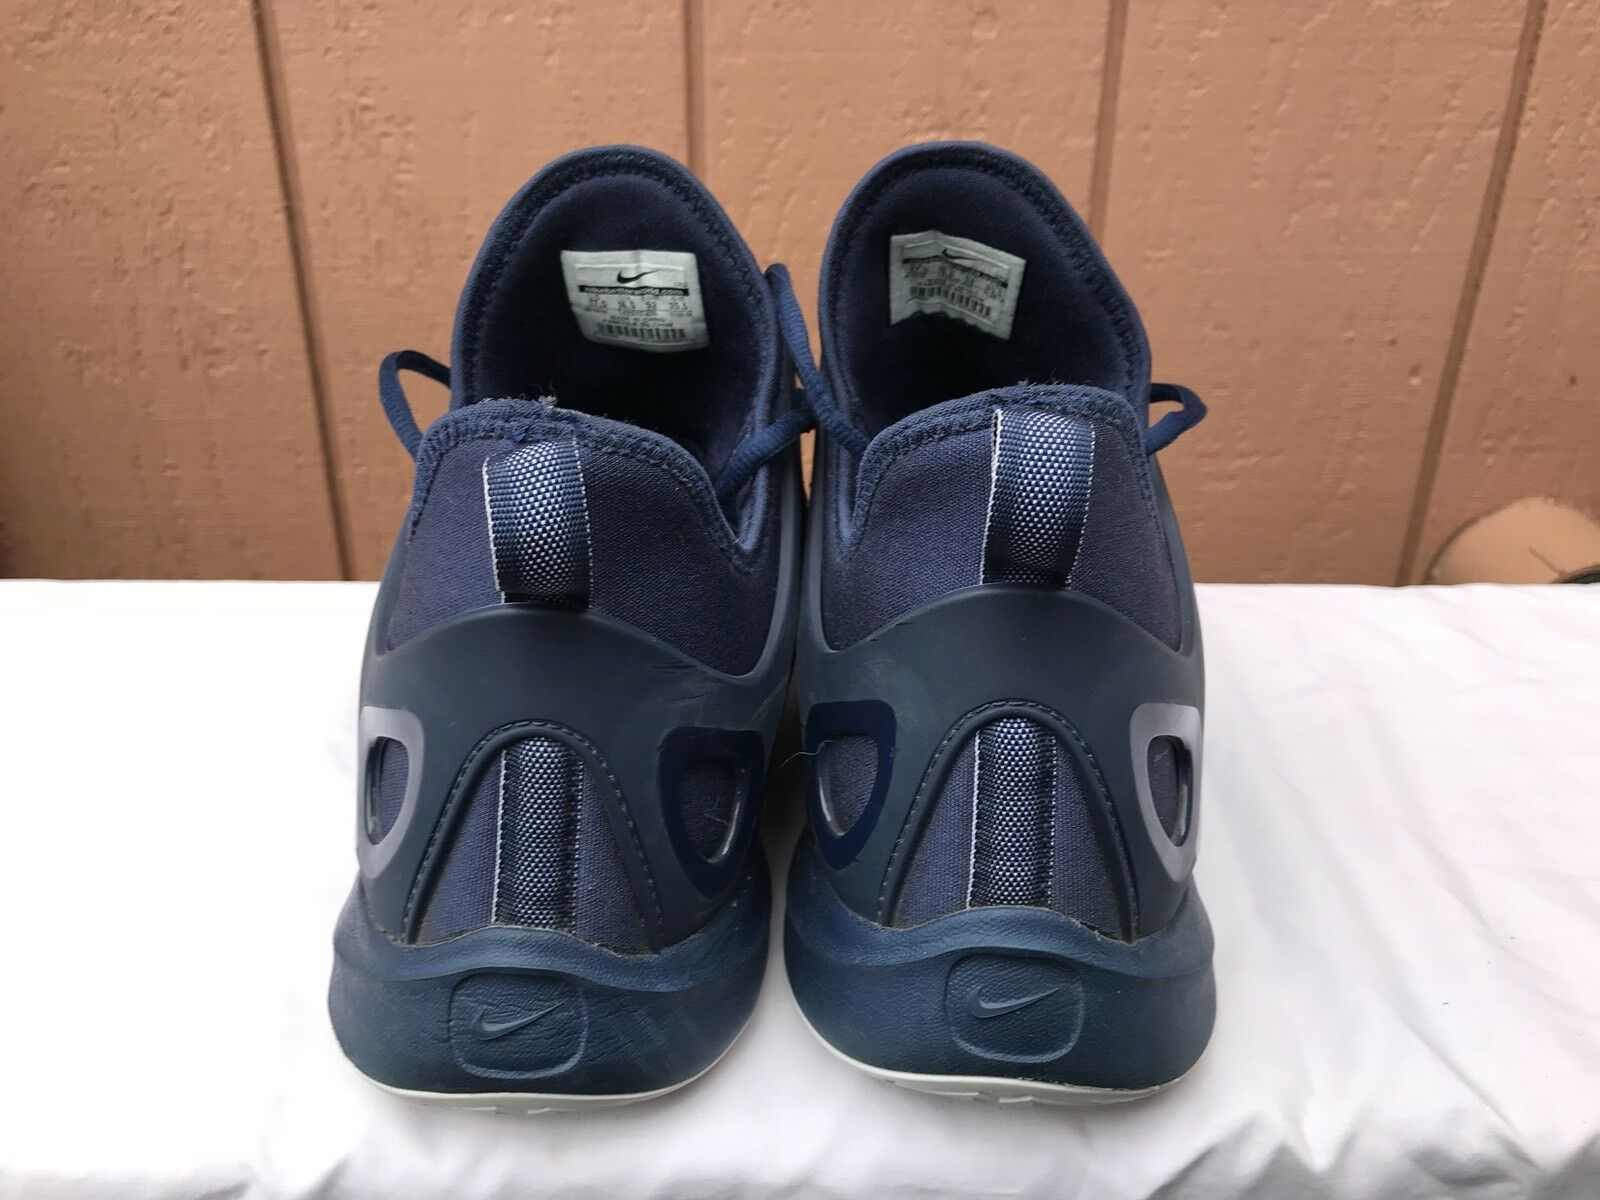 reputable site aeb03 40ec6 ... EUC Nike Zoom hyperrev 2018 Basketbal zapatos 742247 405 405 405 Azul  marino blanco 17, ...